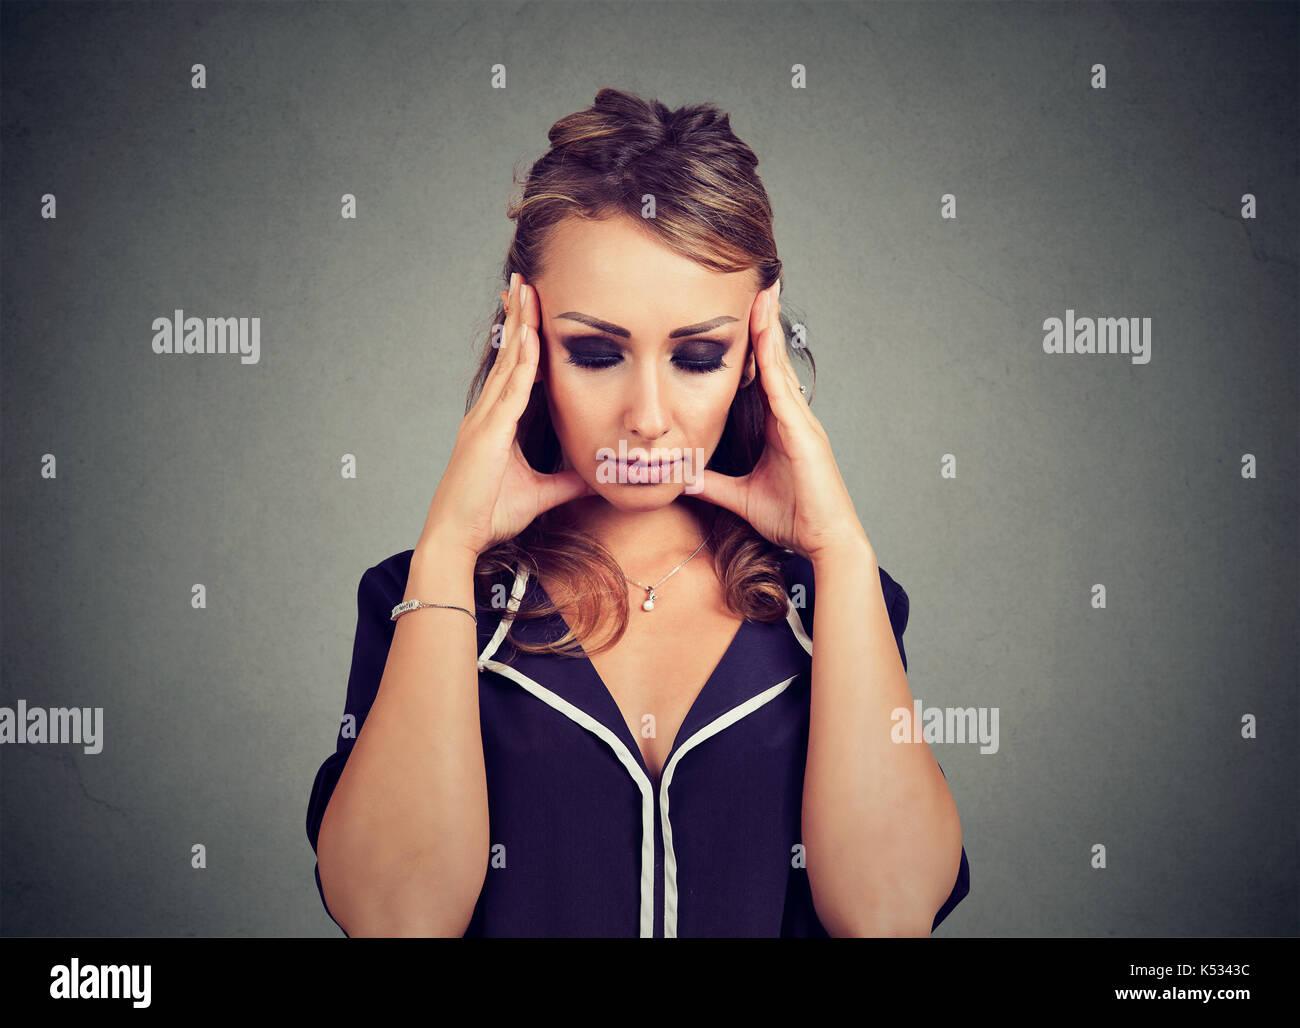 Closeup retrato triste mujer con expresión de cara destacó preocupados mirando hacia abajo Imagen De Stock